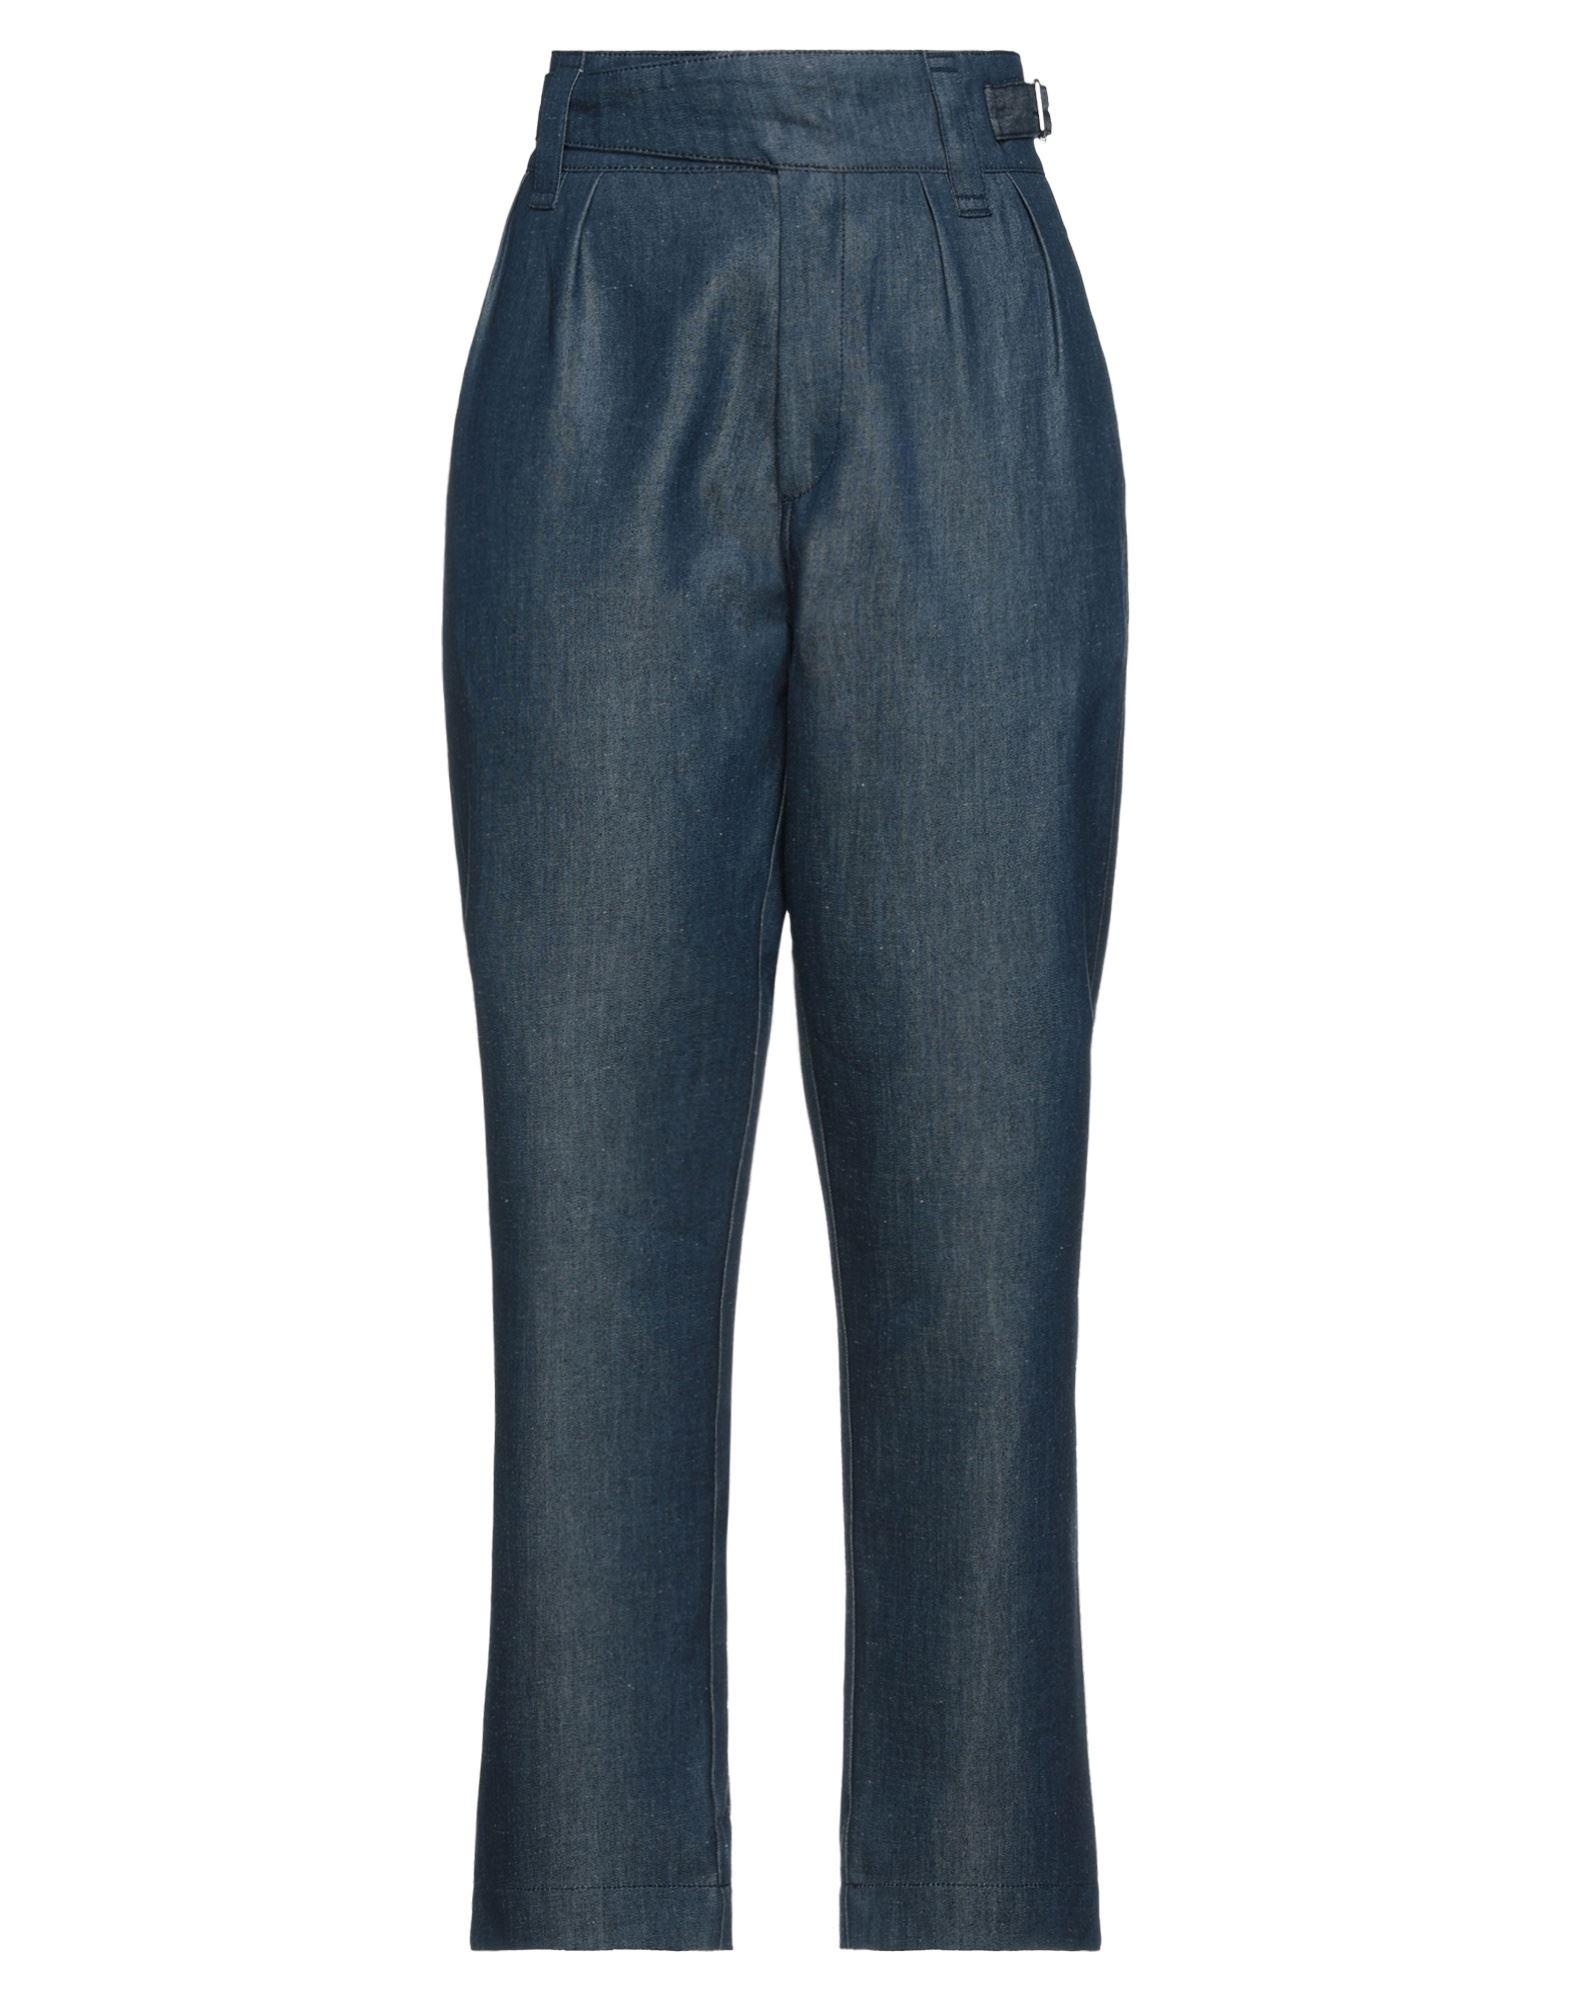 MAISON KITSUNÉ Denim pants - Item 42840751